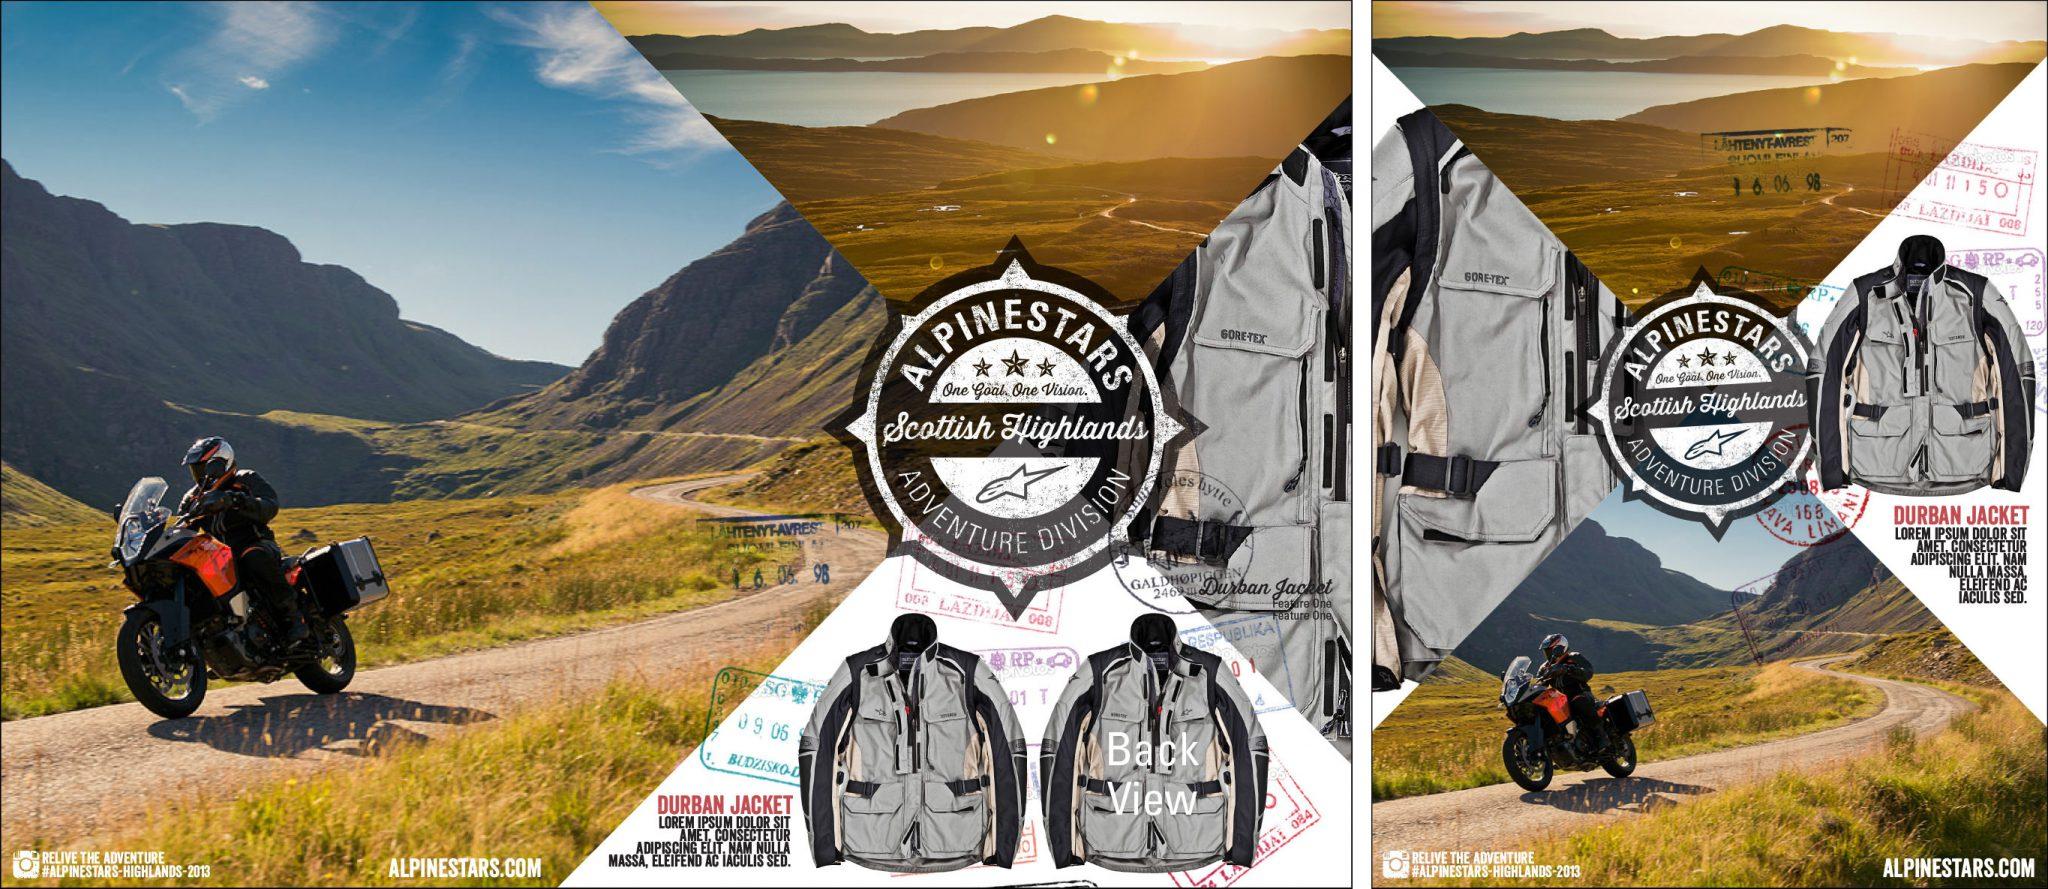 Alpinestars Adventure Ads